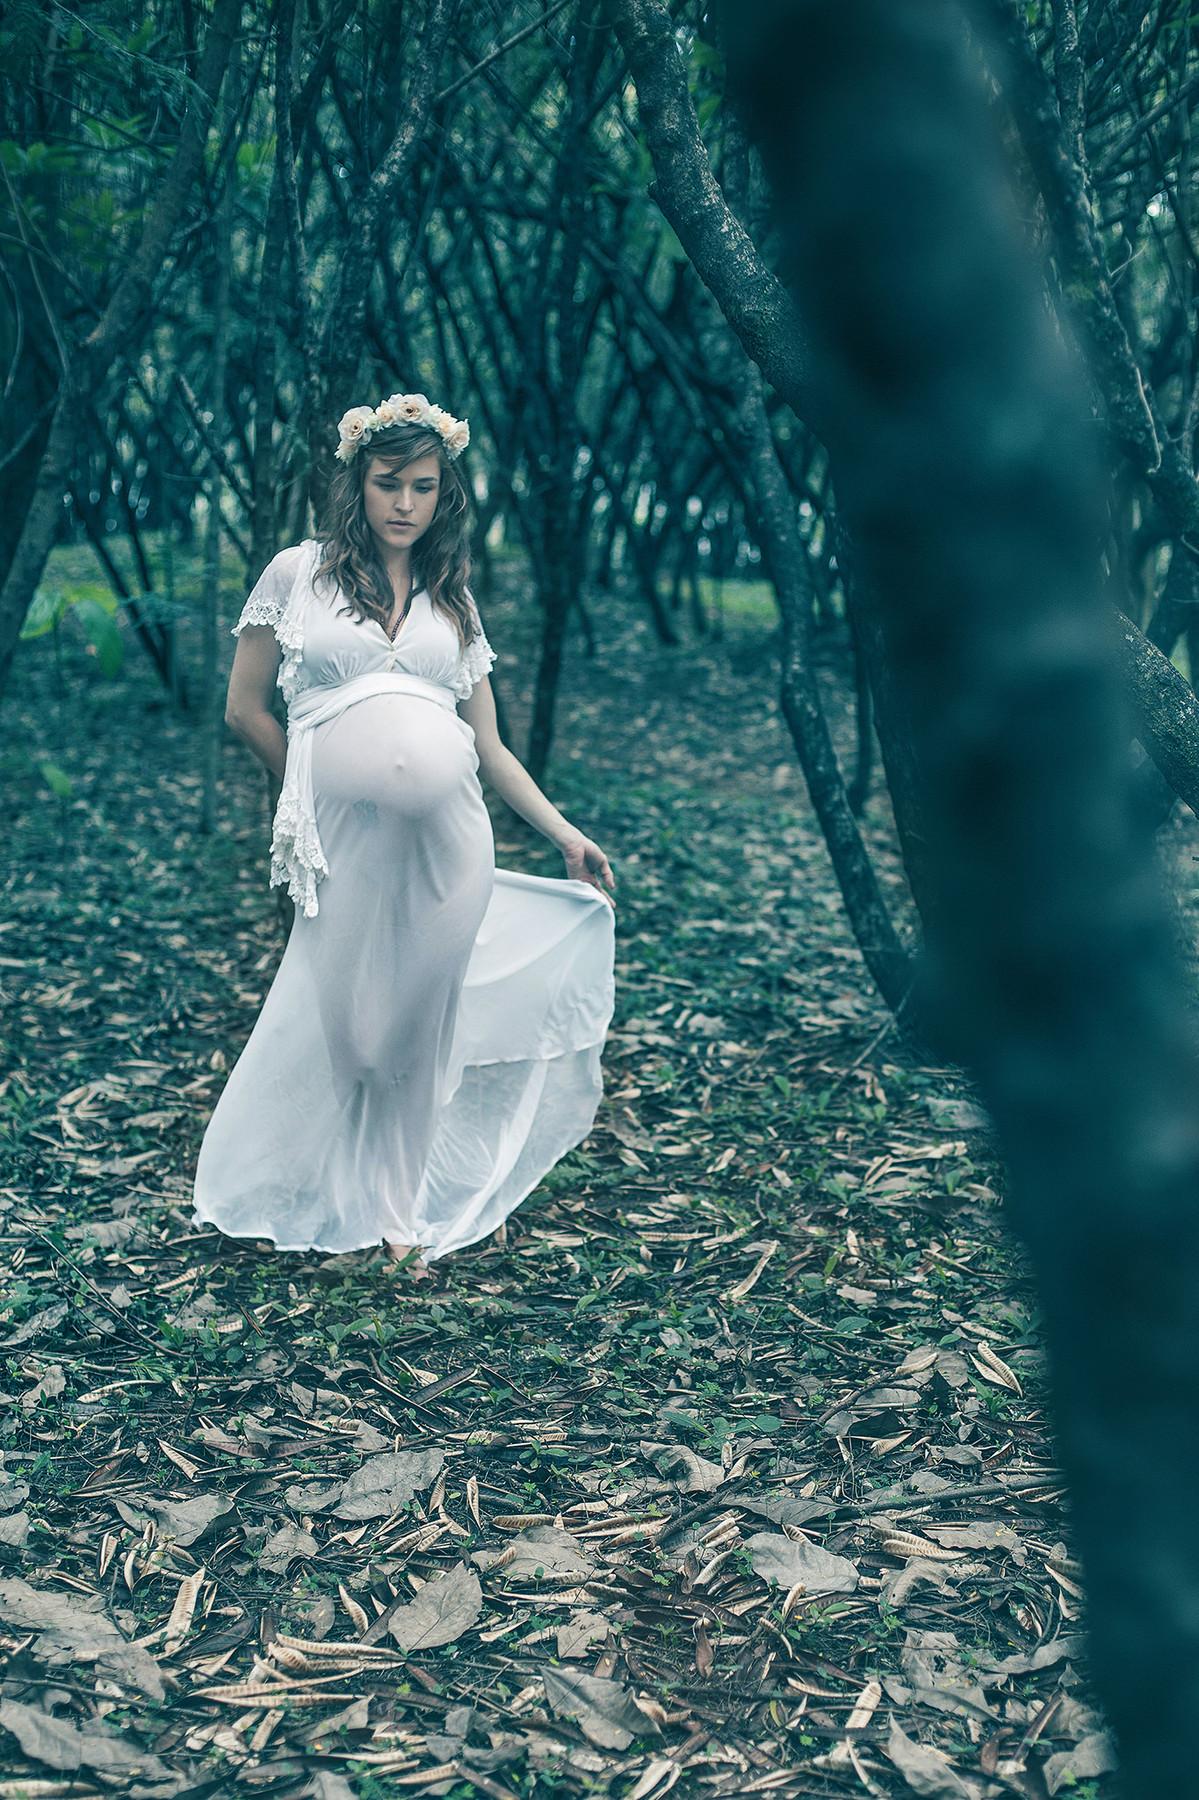 Gestante andando pela floresta com vestido branco